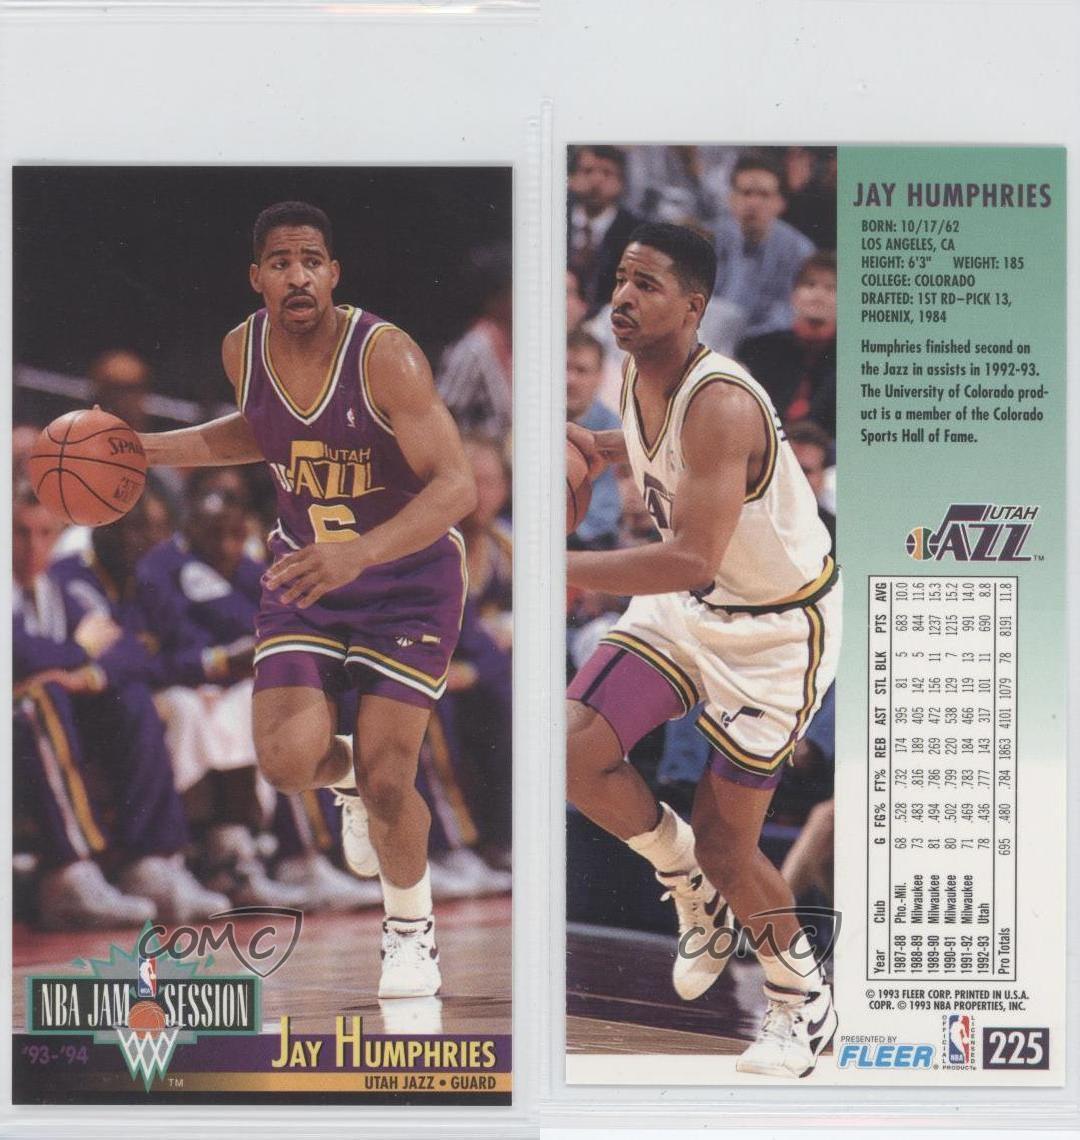 1993-94 NBA Jam Session #225 Jay Humphries Utah Jazz